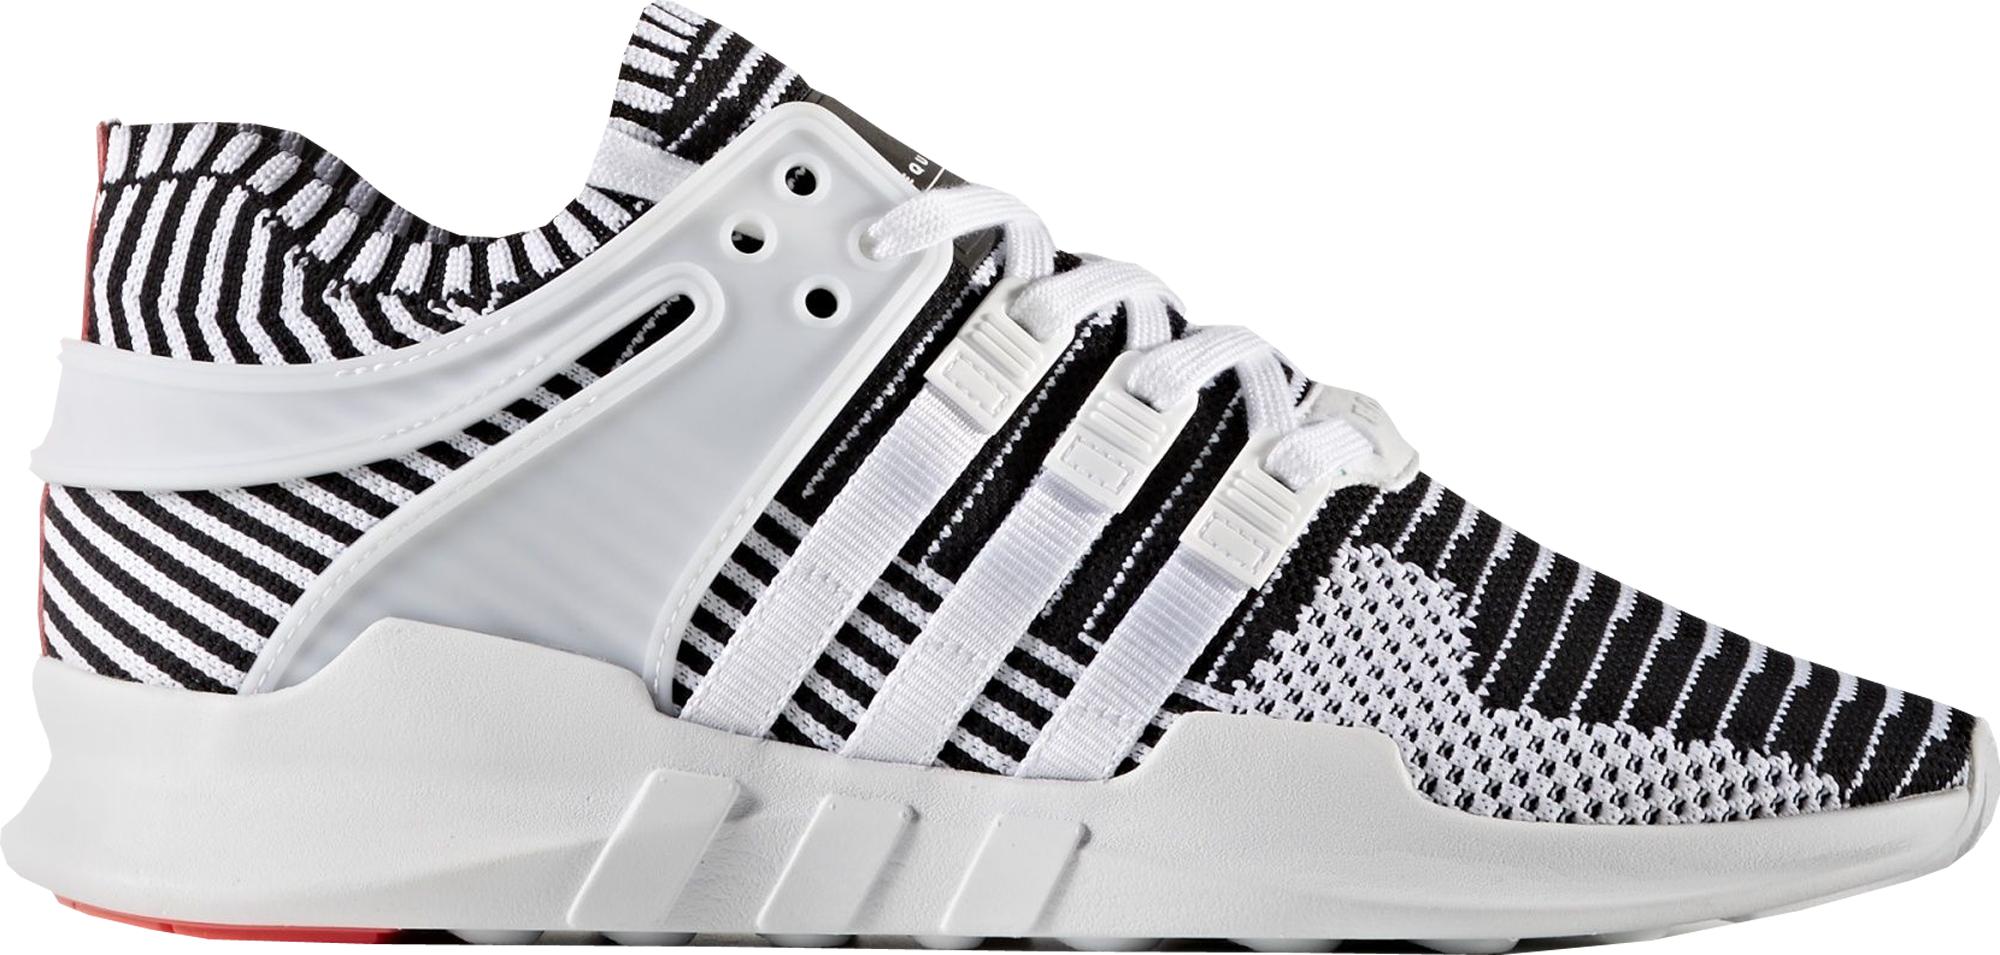 adidas EQT Support ADV Zebra - BA7496